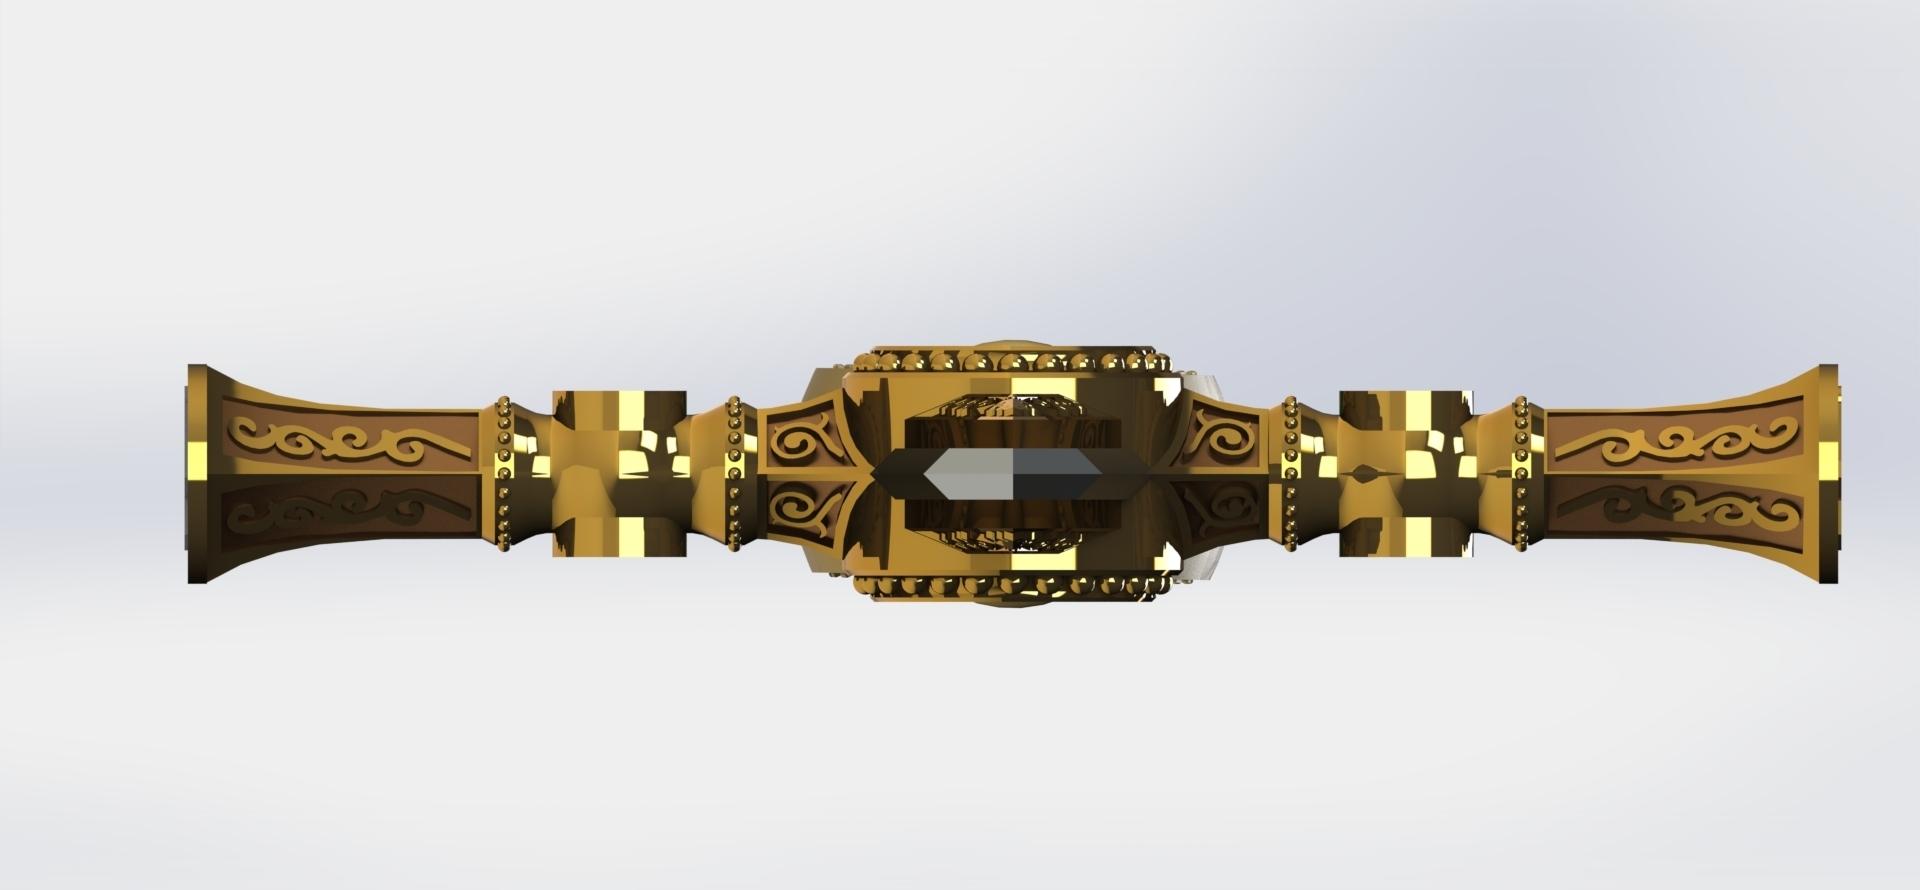 preview6.JPG Download STL file Masonic Ceremony Sword-Ready 3D Print • 3D printable template, GokBoru